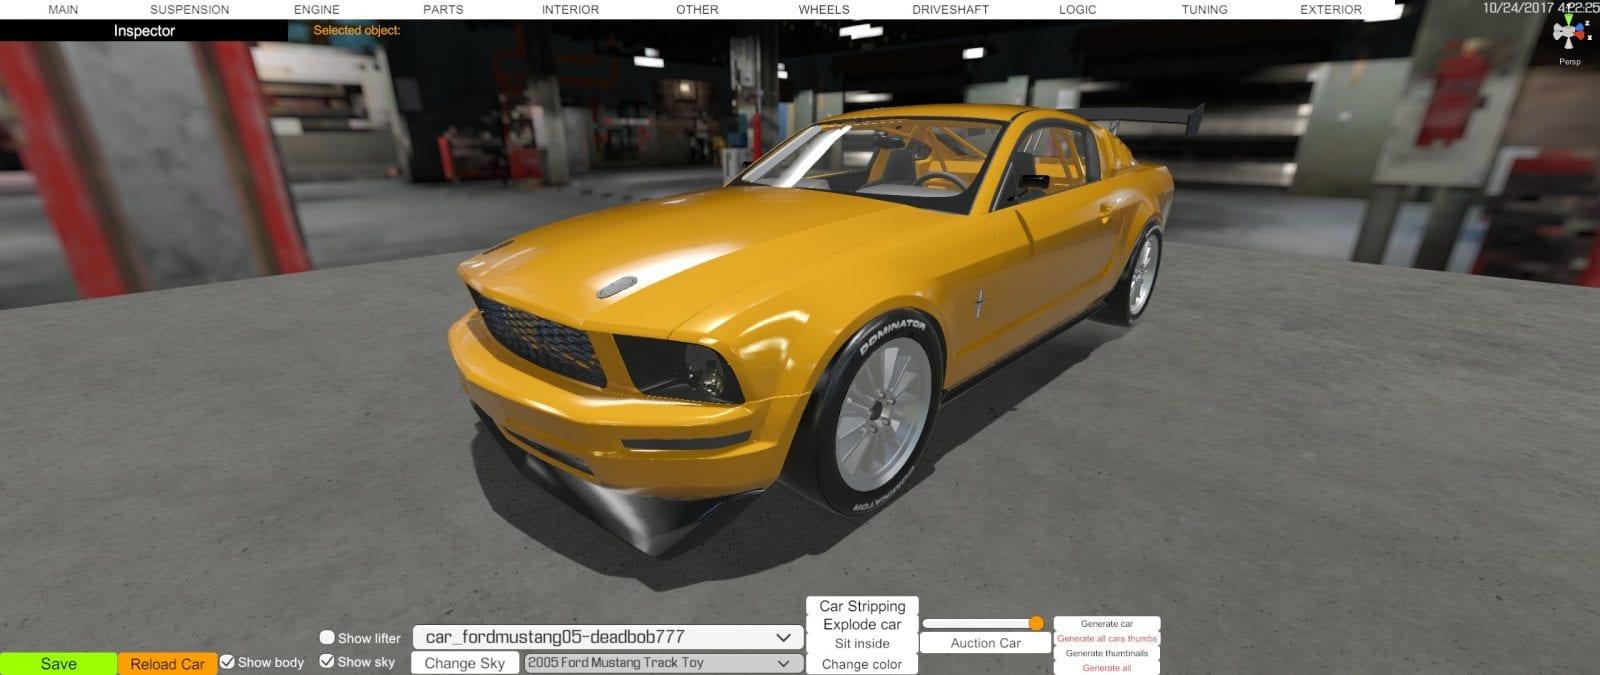 2005 Ford Mustang Mod for Car Mechanic Simulator 2018